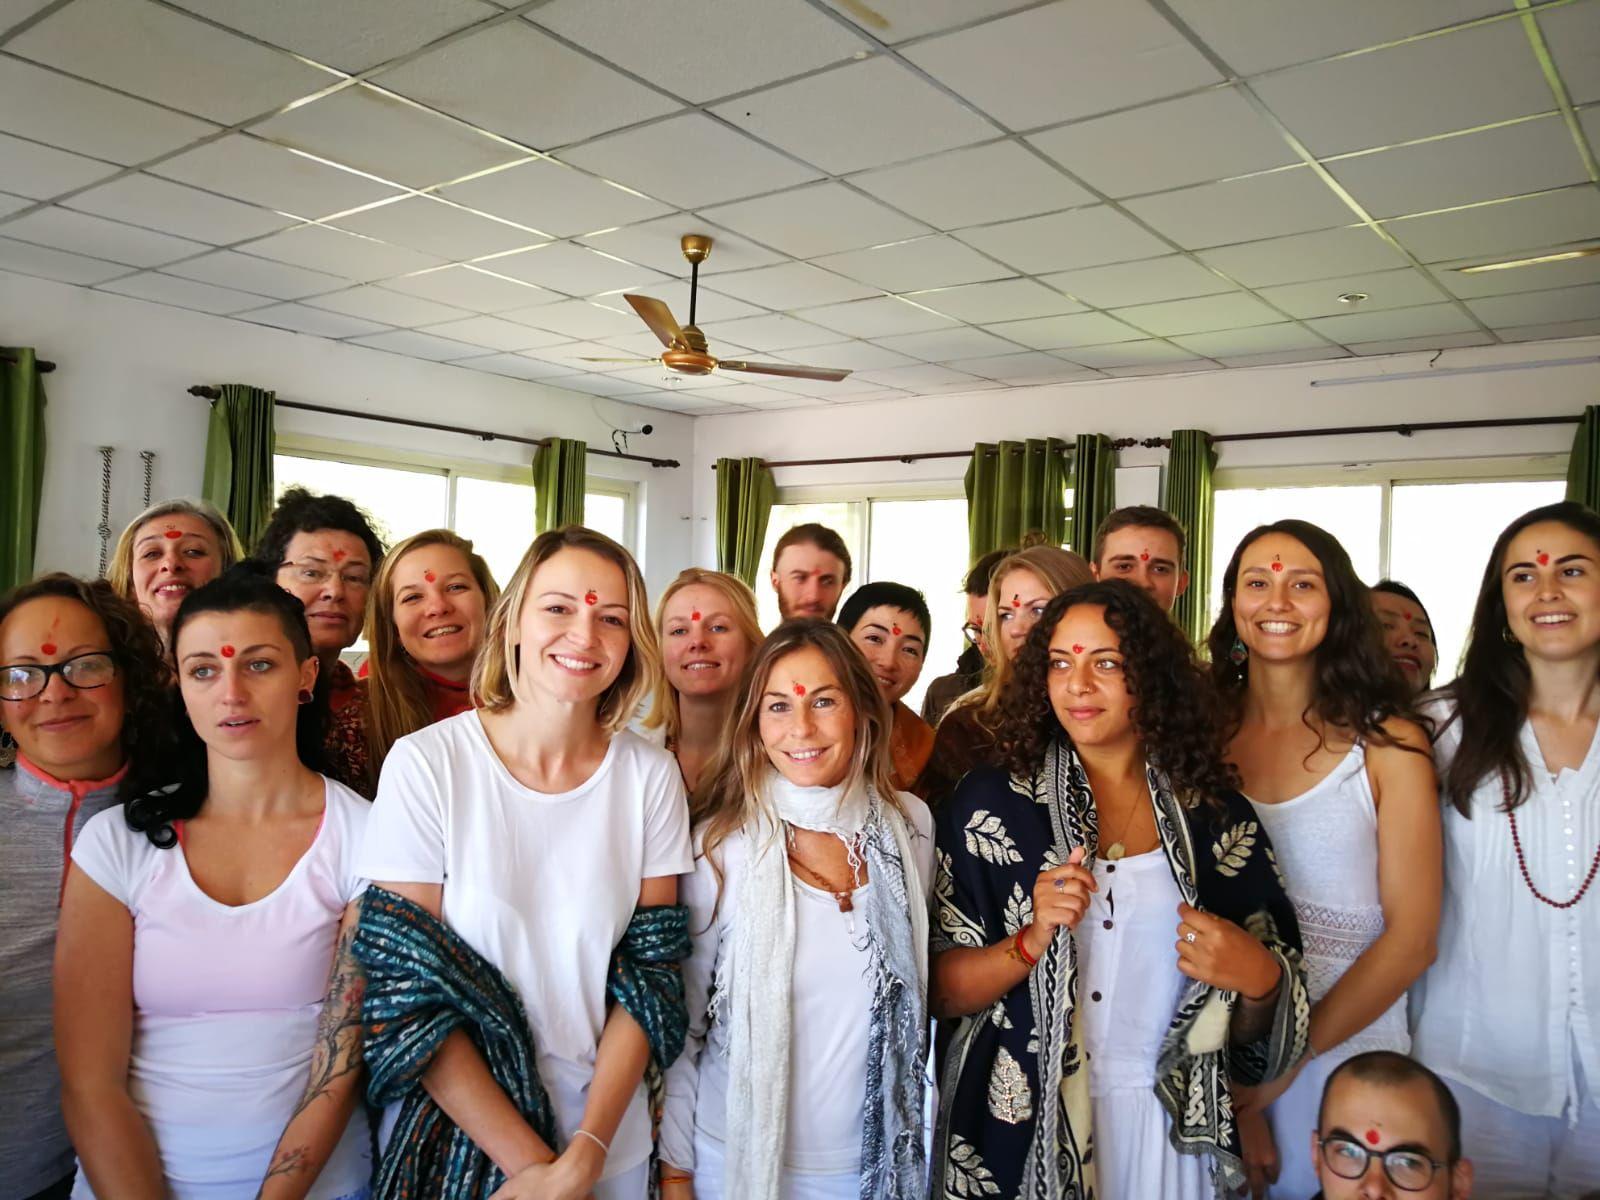 200 Hour Yoga Teacher Training In Bali Indonesia 200 Hour Yoga Teacher Training Yoga Teacher Training Yoga Teacher